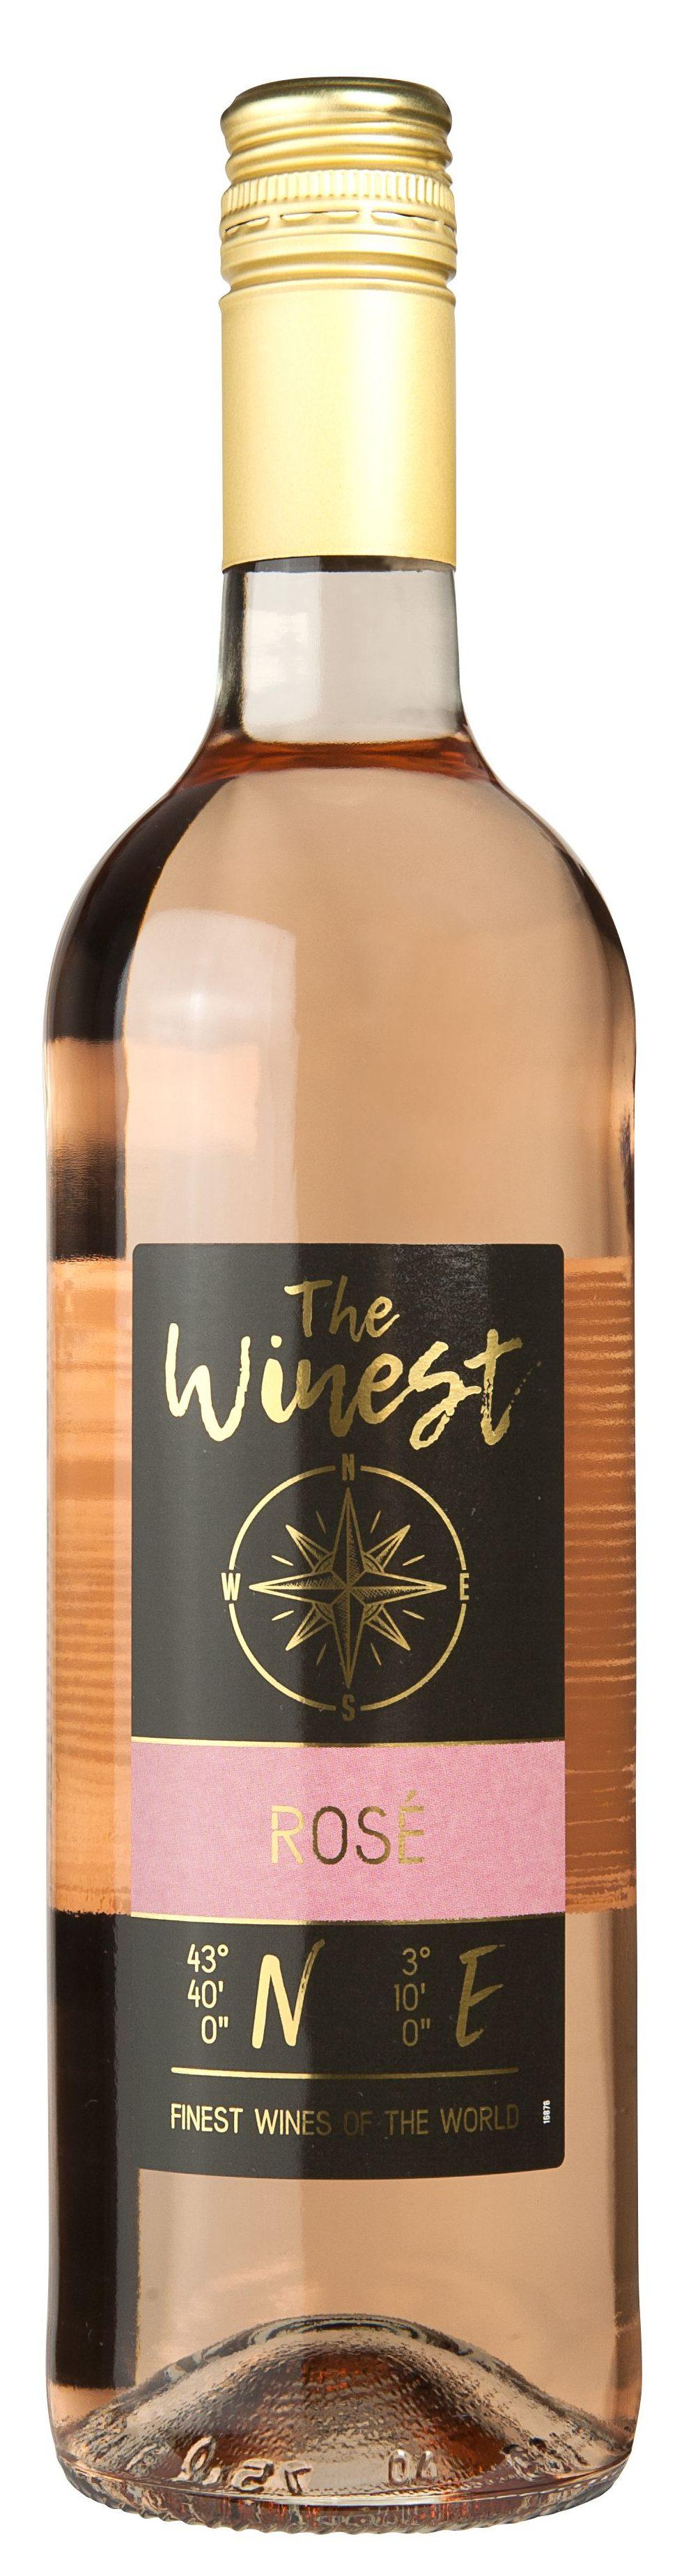 The Winest, Grenache Rosé